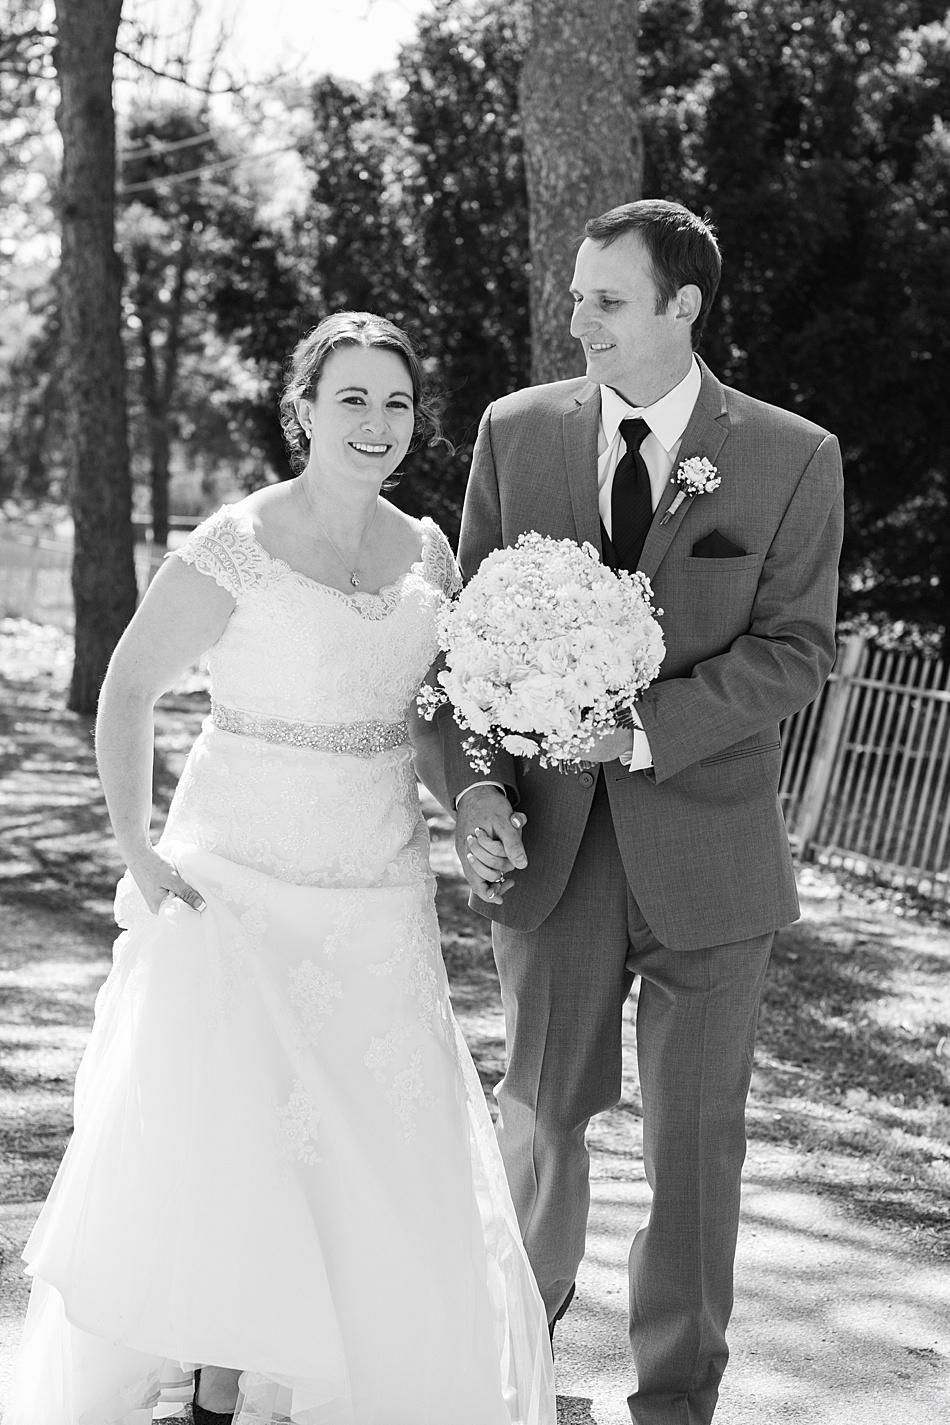 A groom gazing at his bride